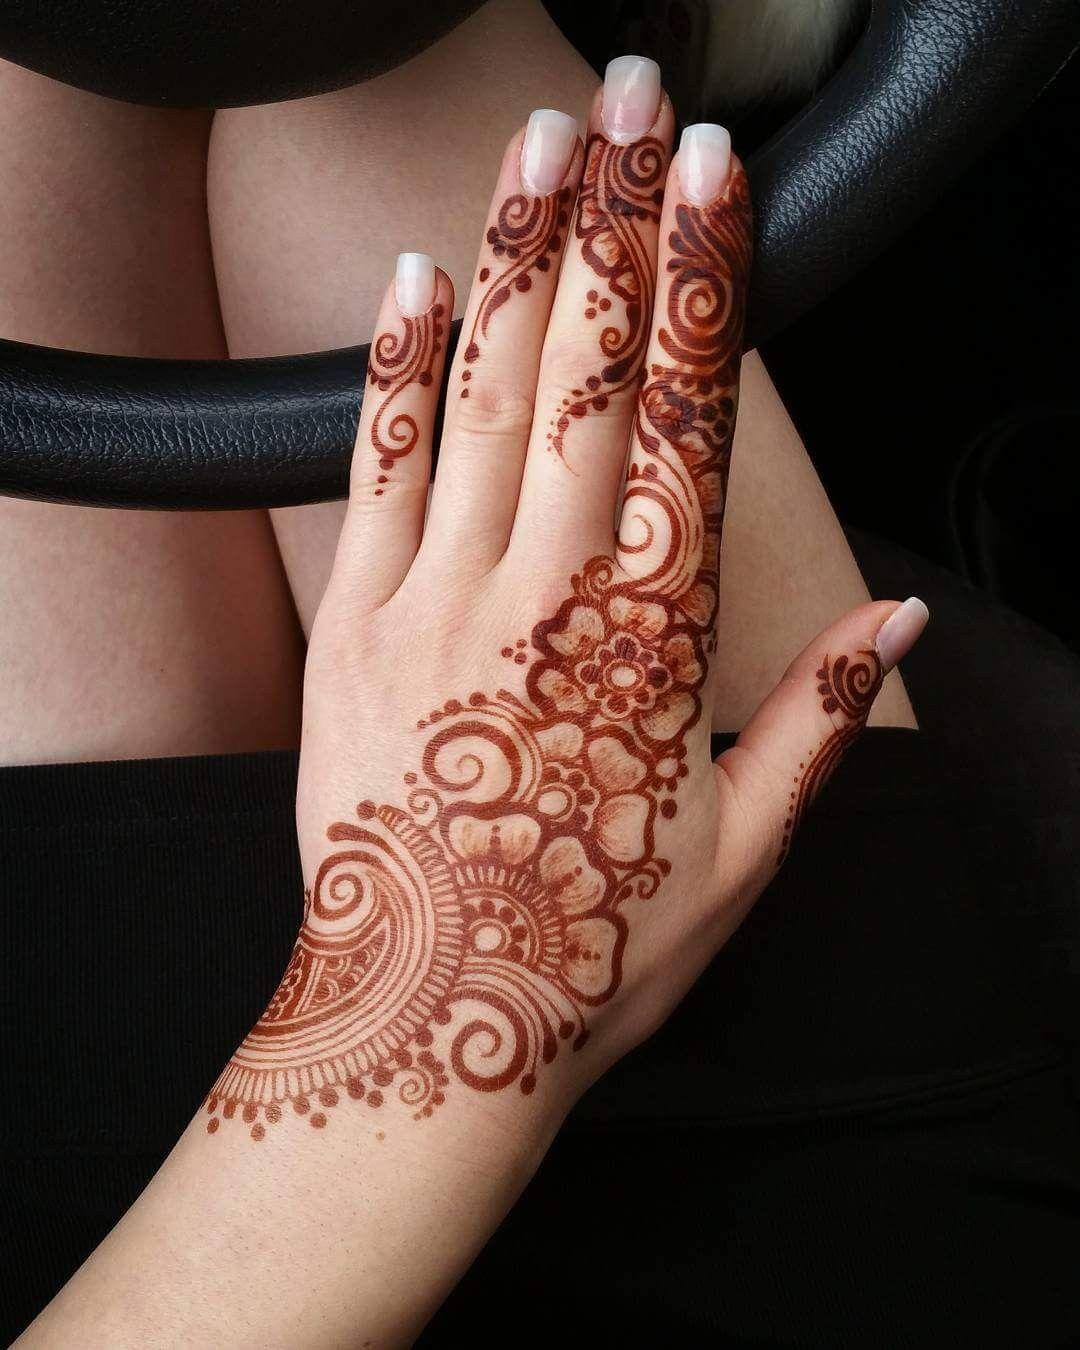 Pin By Morgan On Henna New Mehndi Designs Simple Mehndi Designs